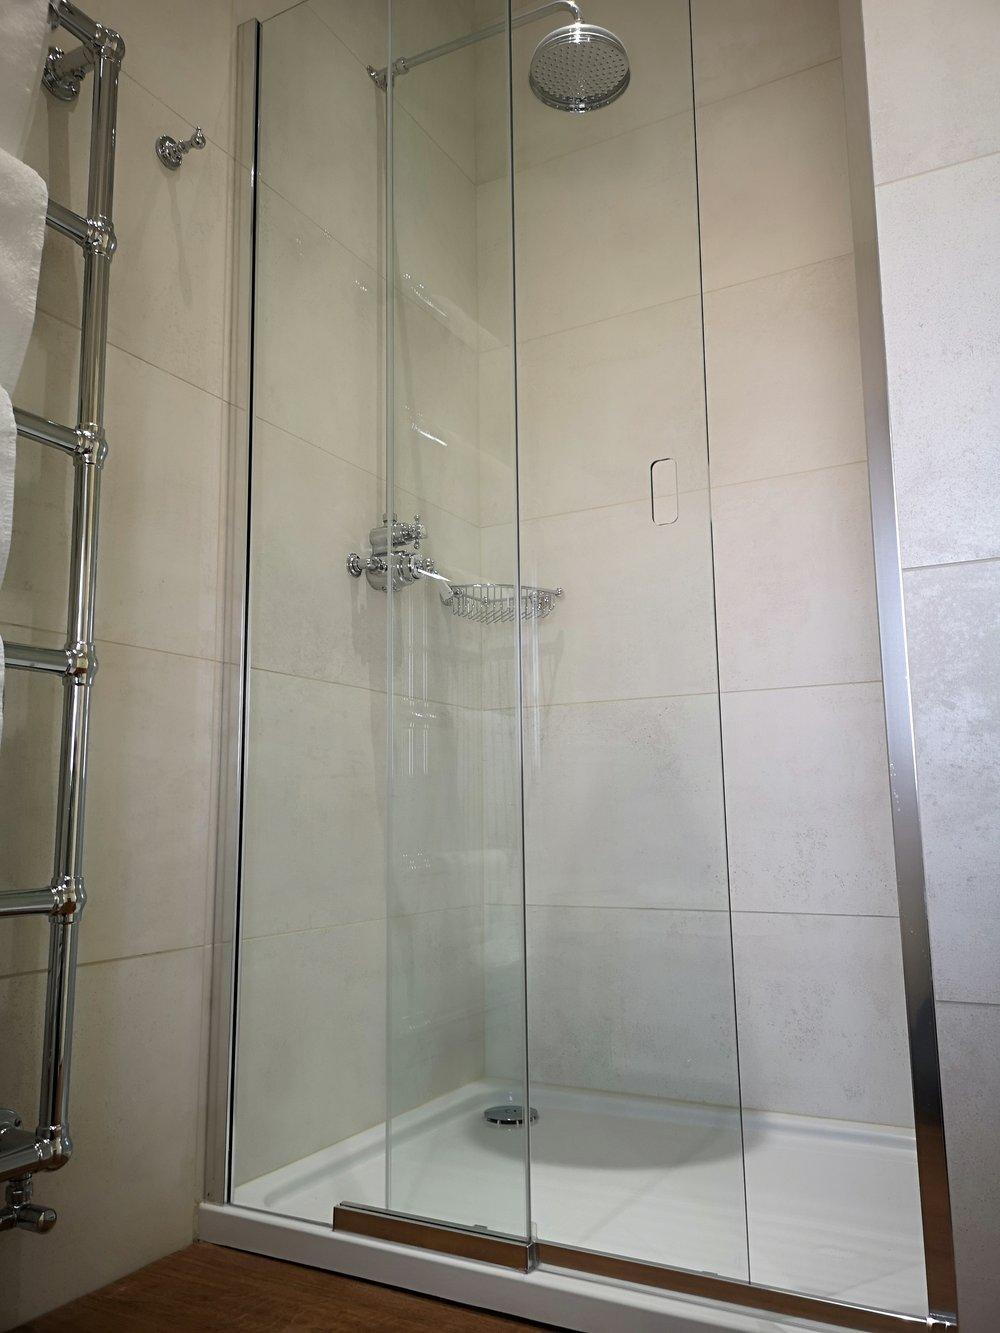 Scotter bathroom